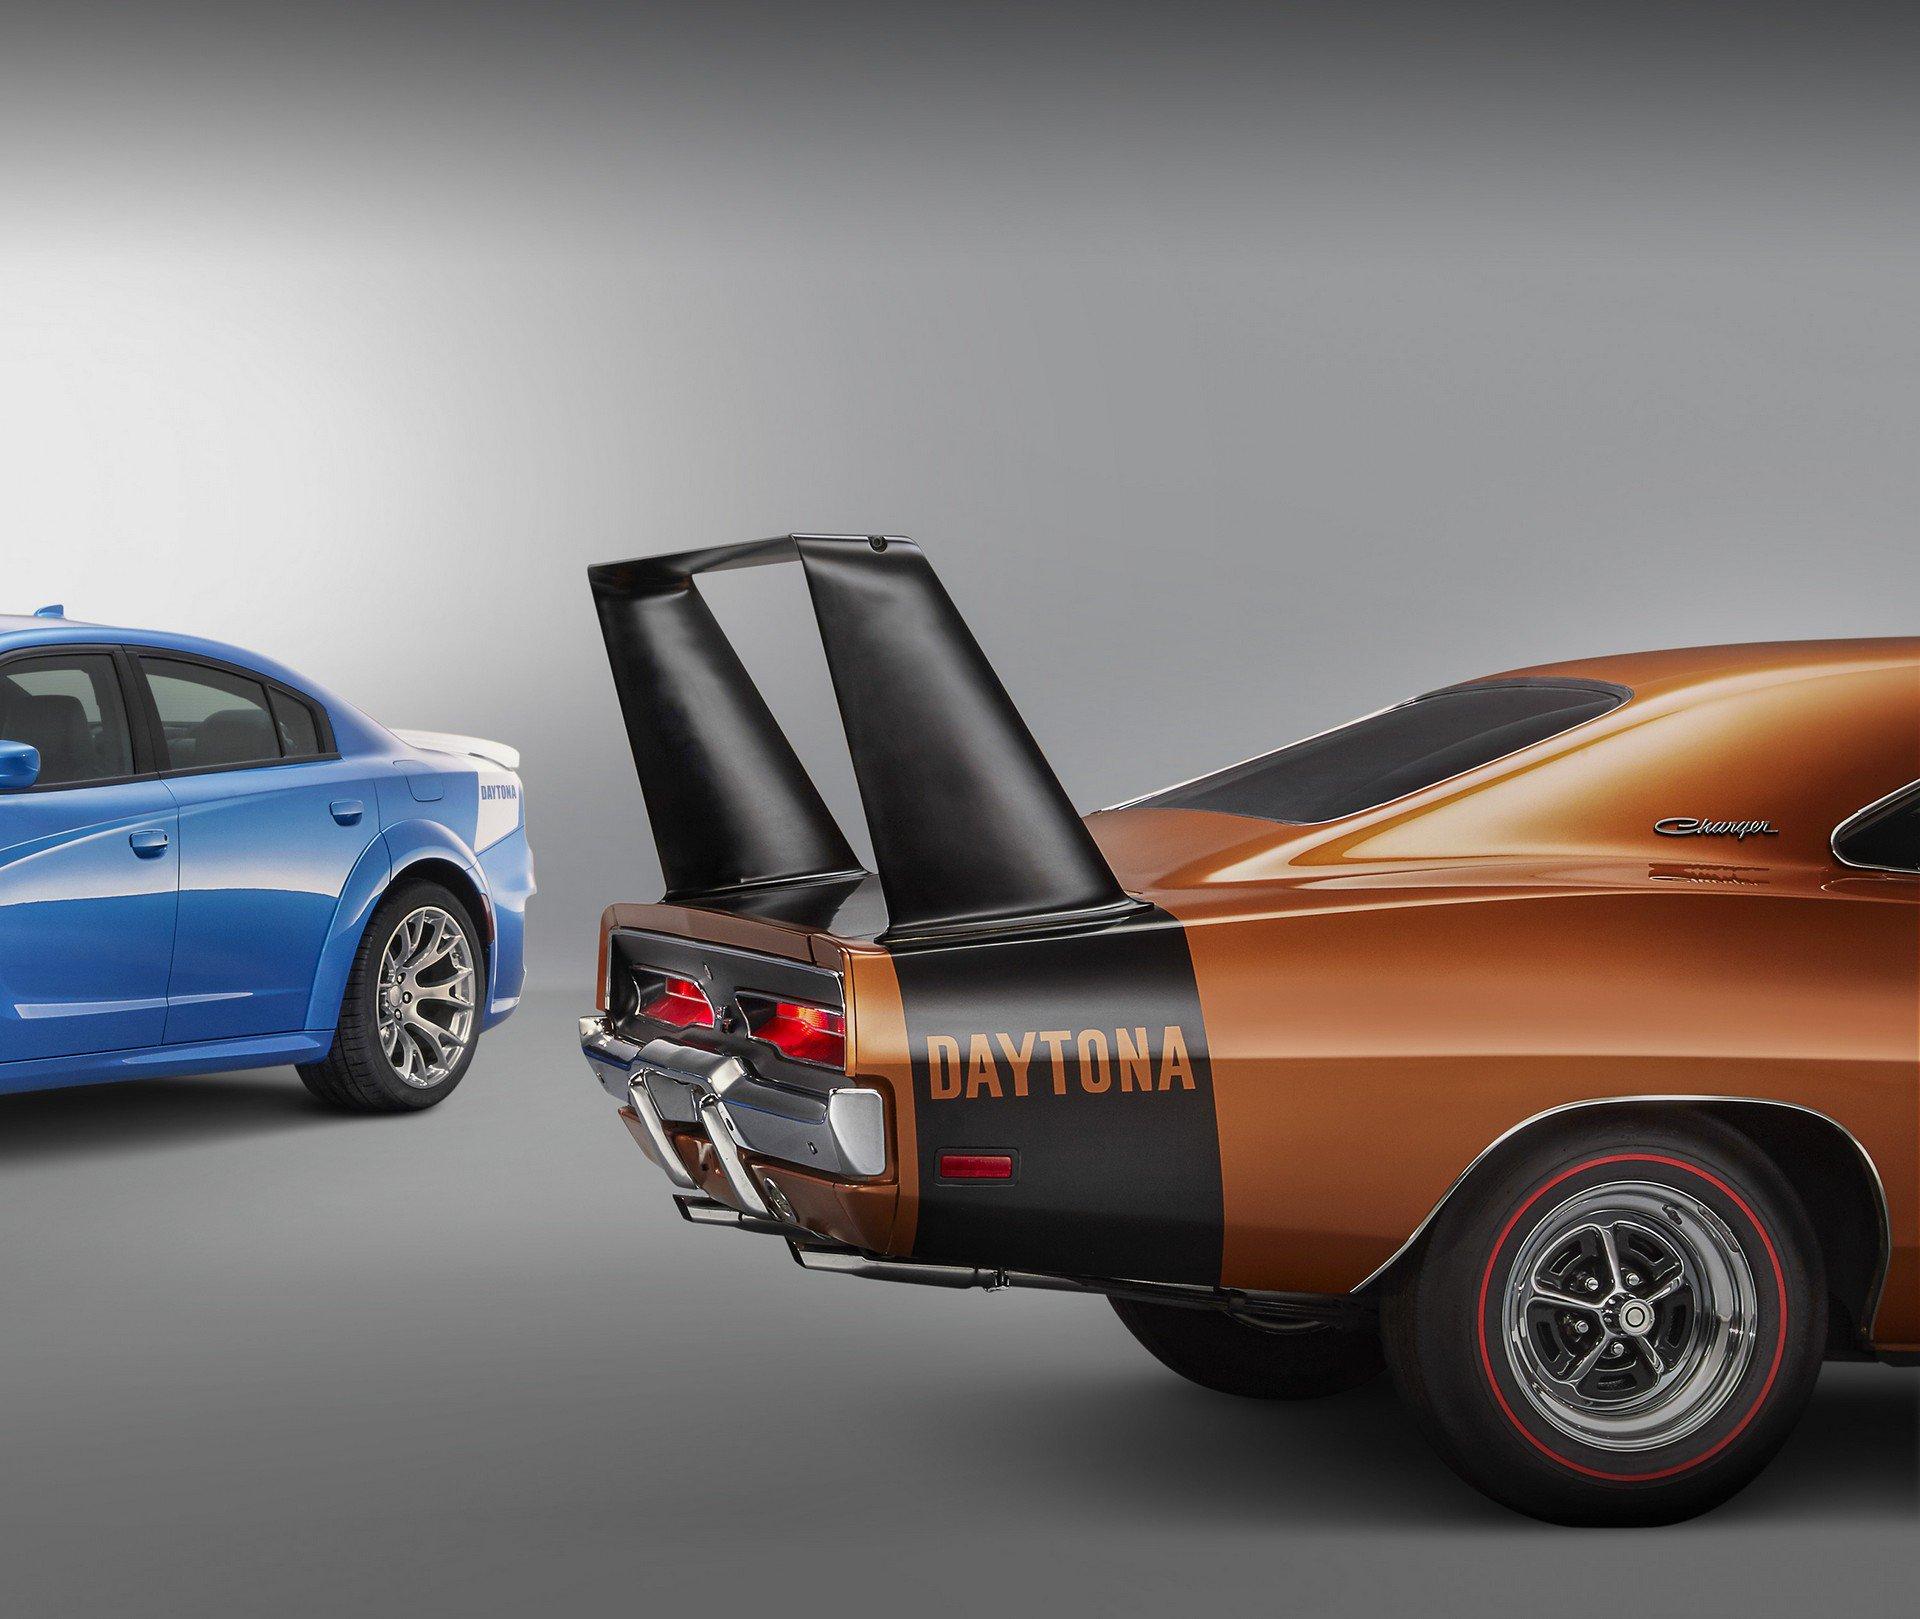 Dodge-Charger-SRT-Hellcat-Widebody-Daytona-50th-Anniversary-Edition-5